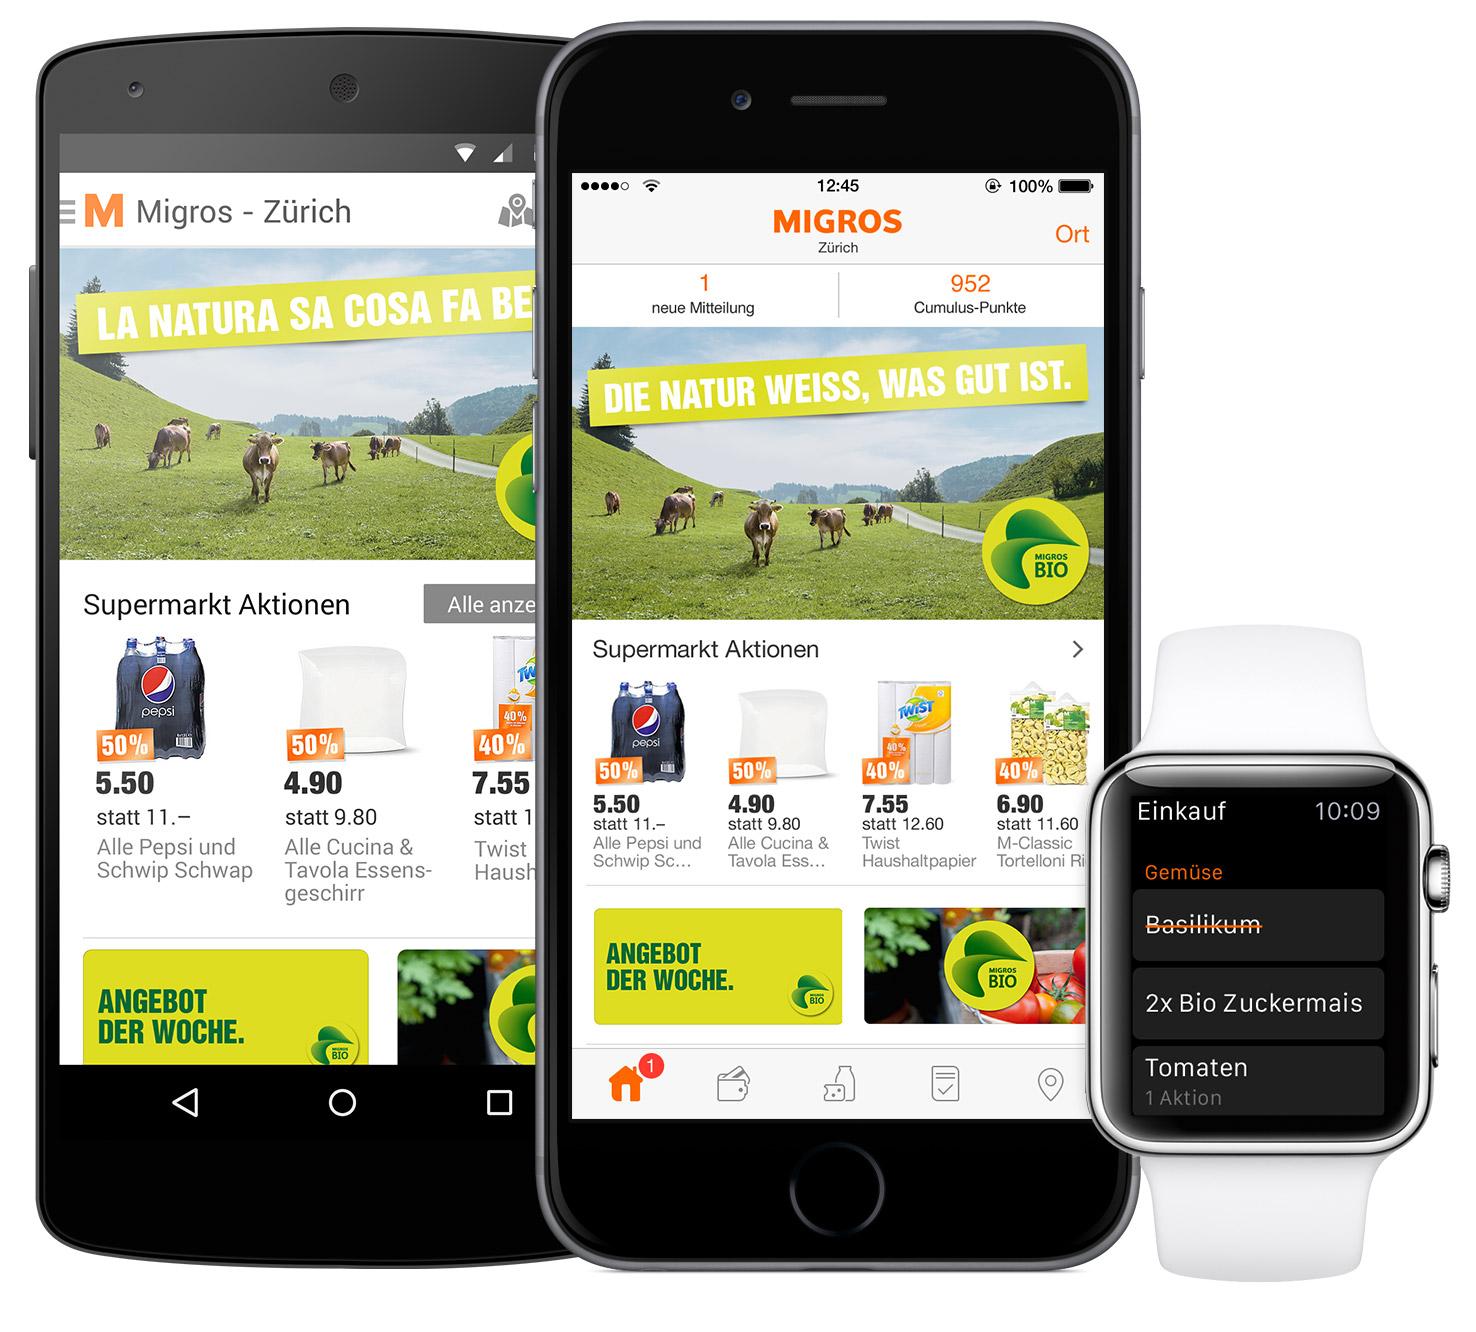 cross-platfrom Migros app